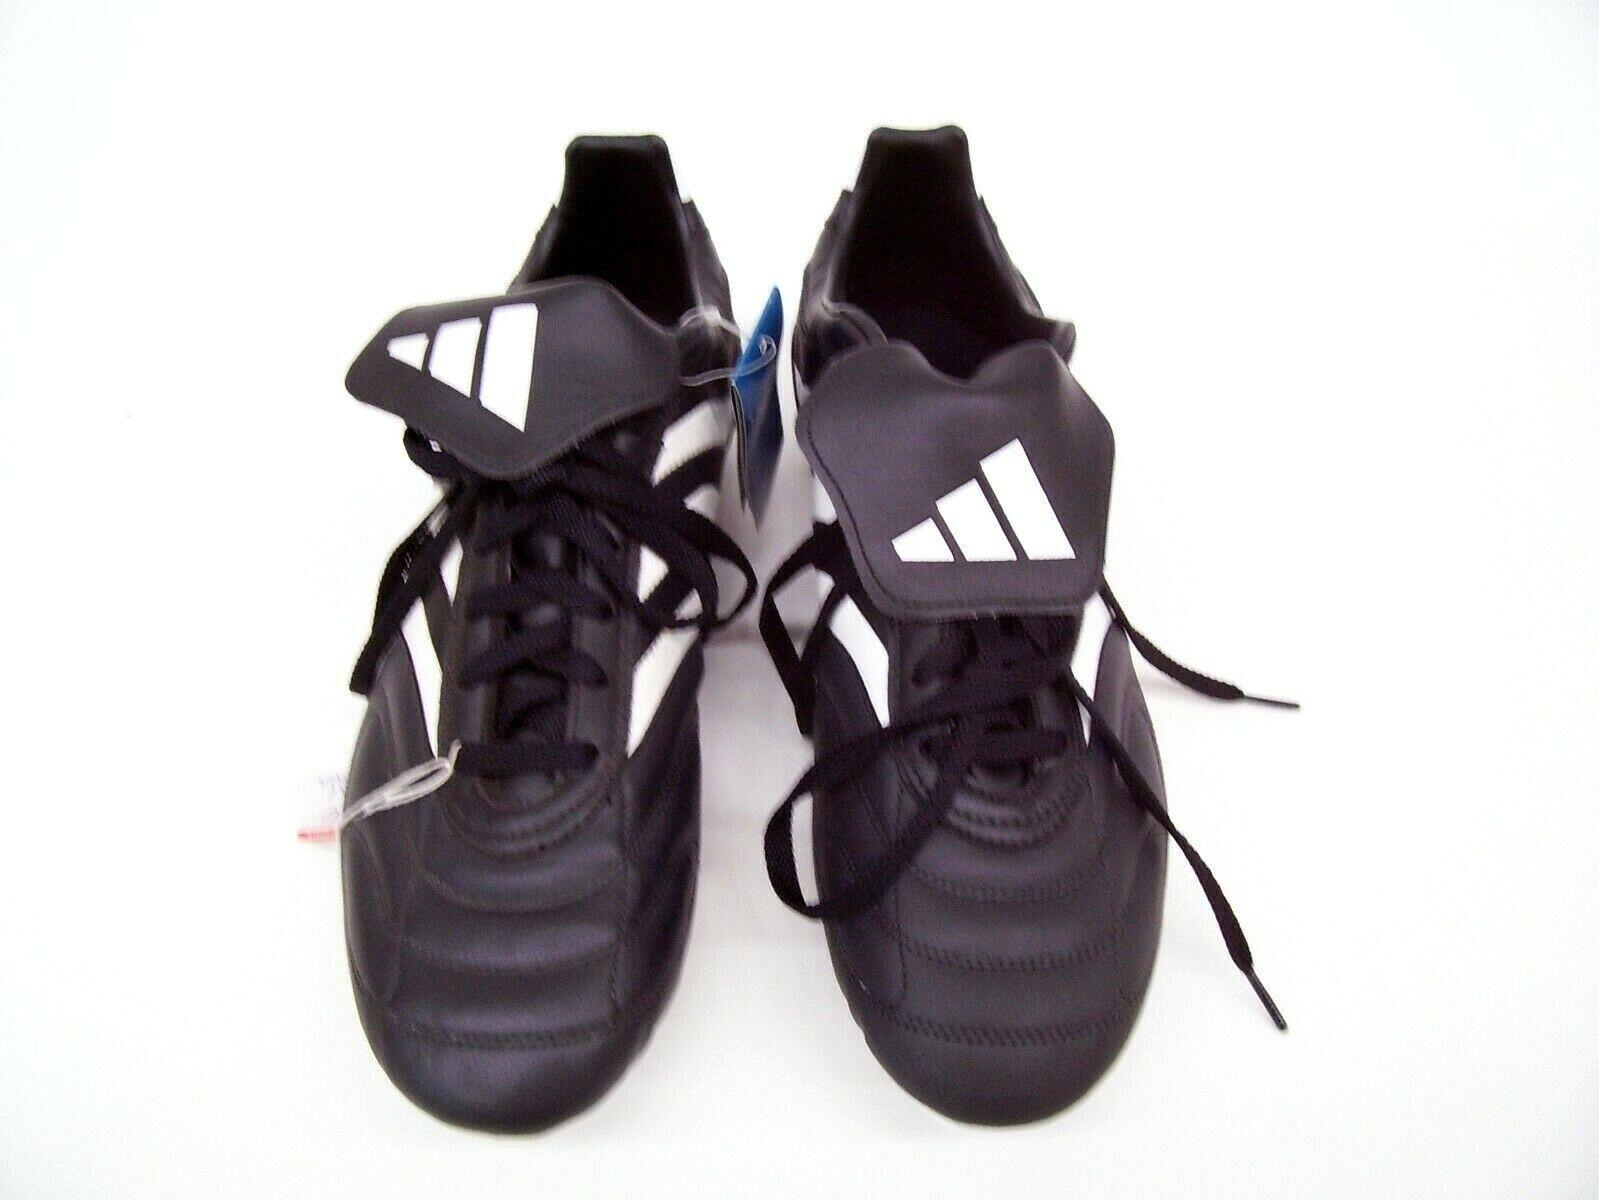 ADIDAS MENS FOOTBALL SOCCER Stiefel CLEATS LACE UP KORESCO SG schwarz Weiß 670975